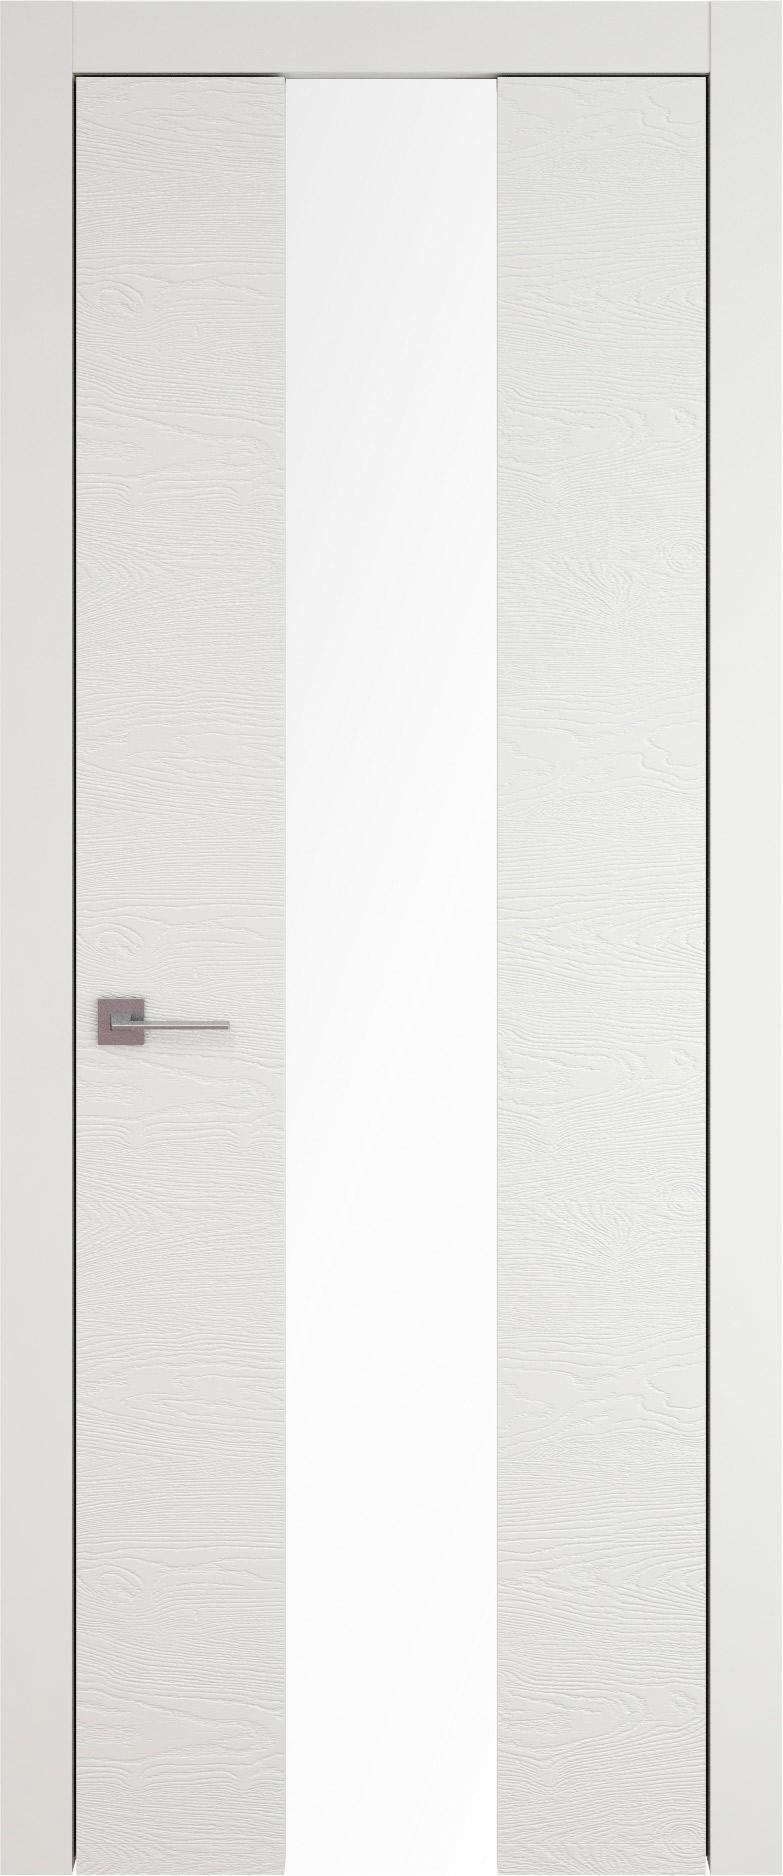 Tivoli Ж-5 цвет - Бежевая эмаль по шпону (RAL 9010) Со стеклом (ДО)